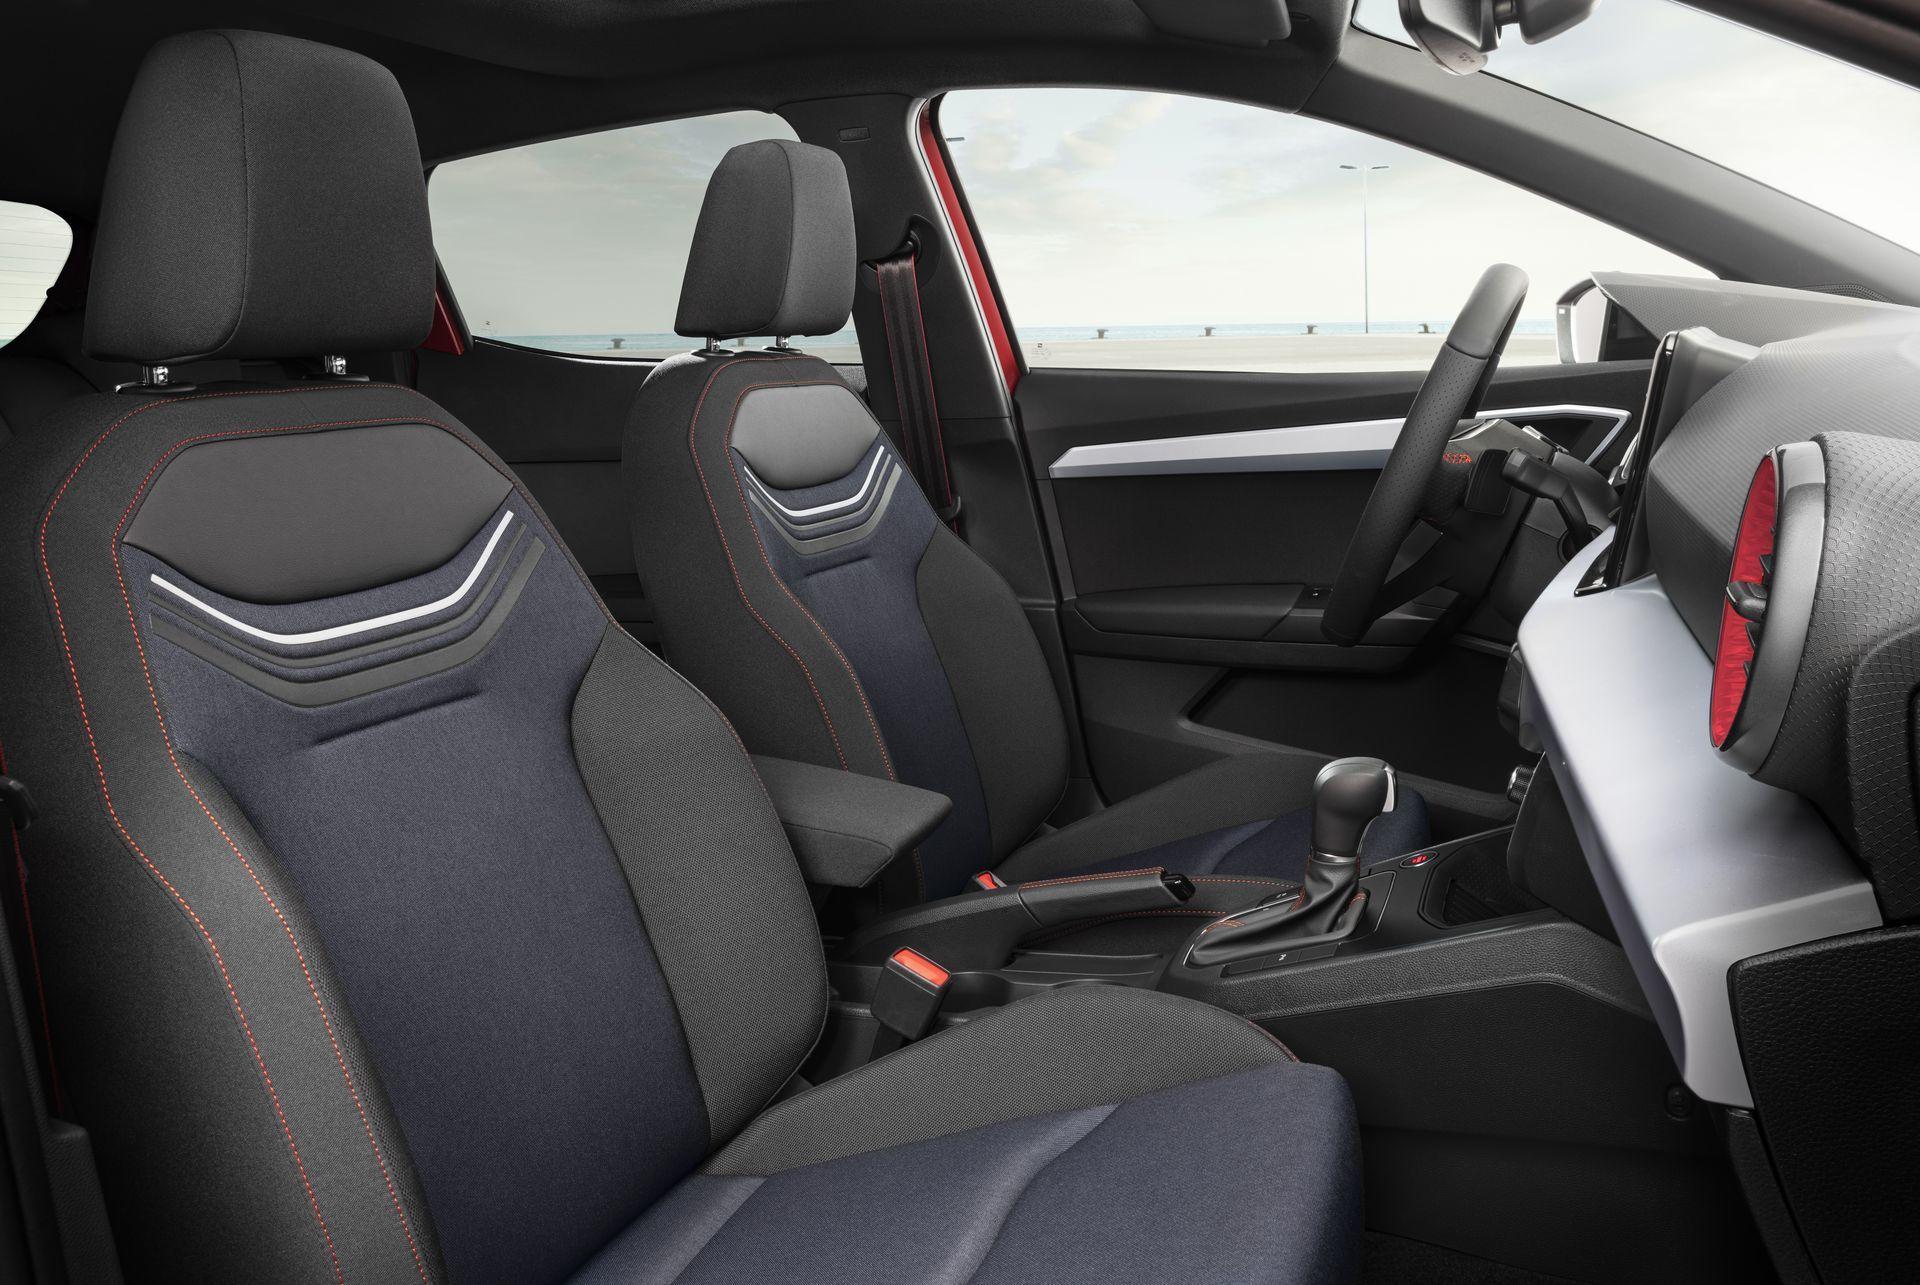 Seat Ibiza 2021 2 Interior